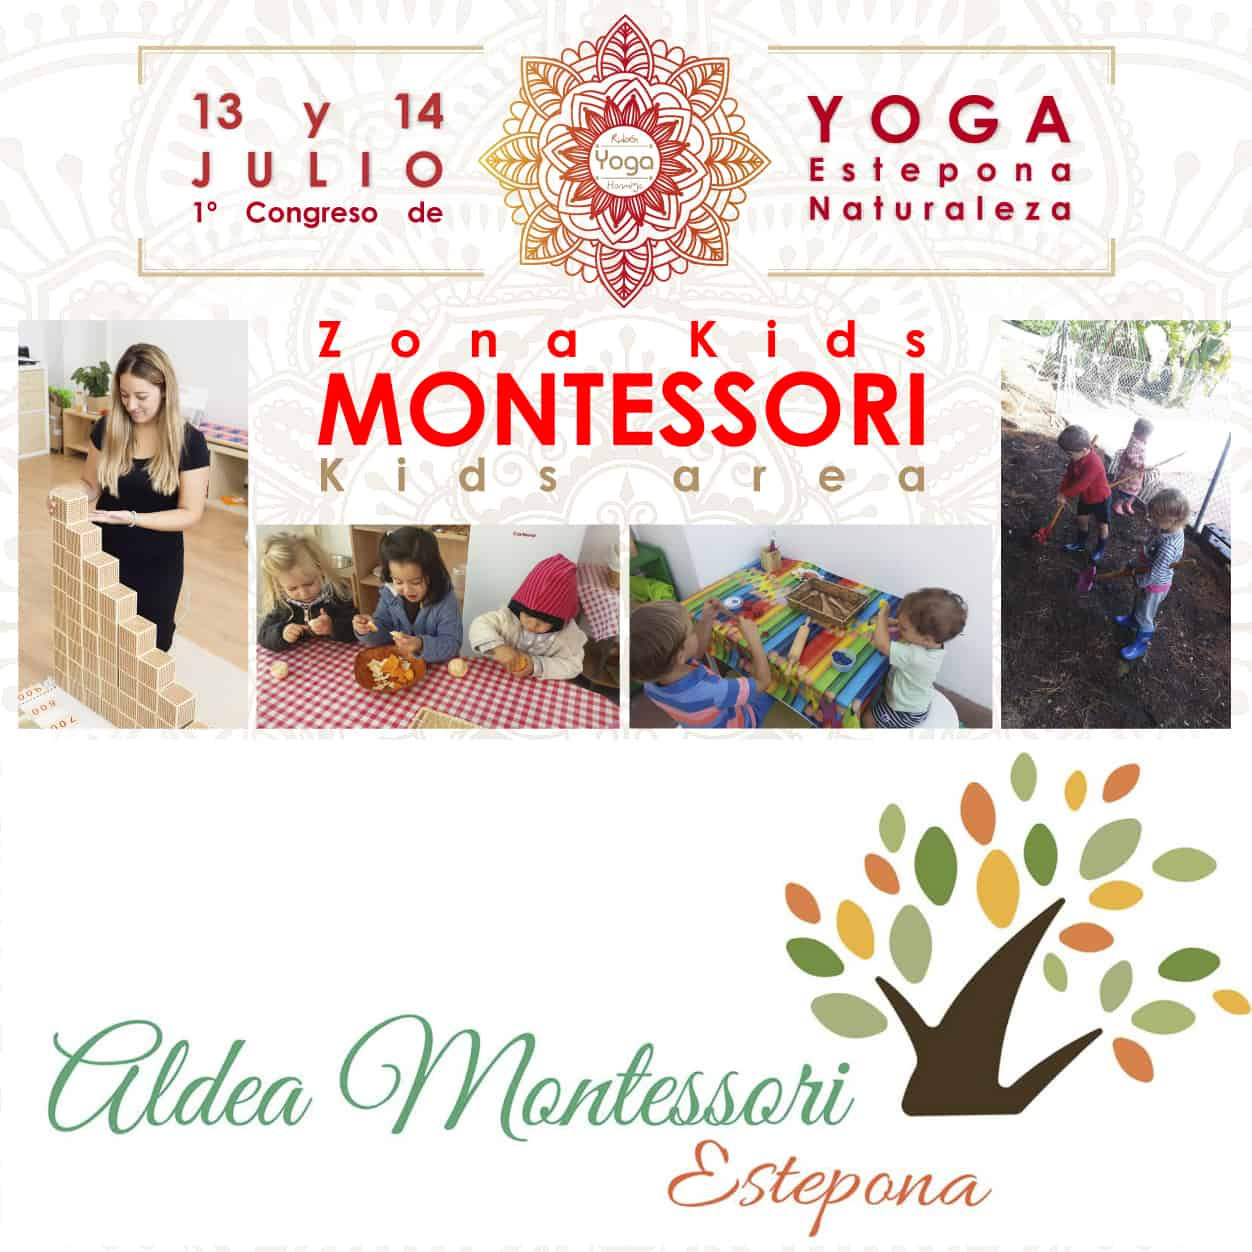 Montessori yogaesteponanaturaleza-01